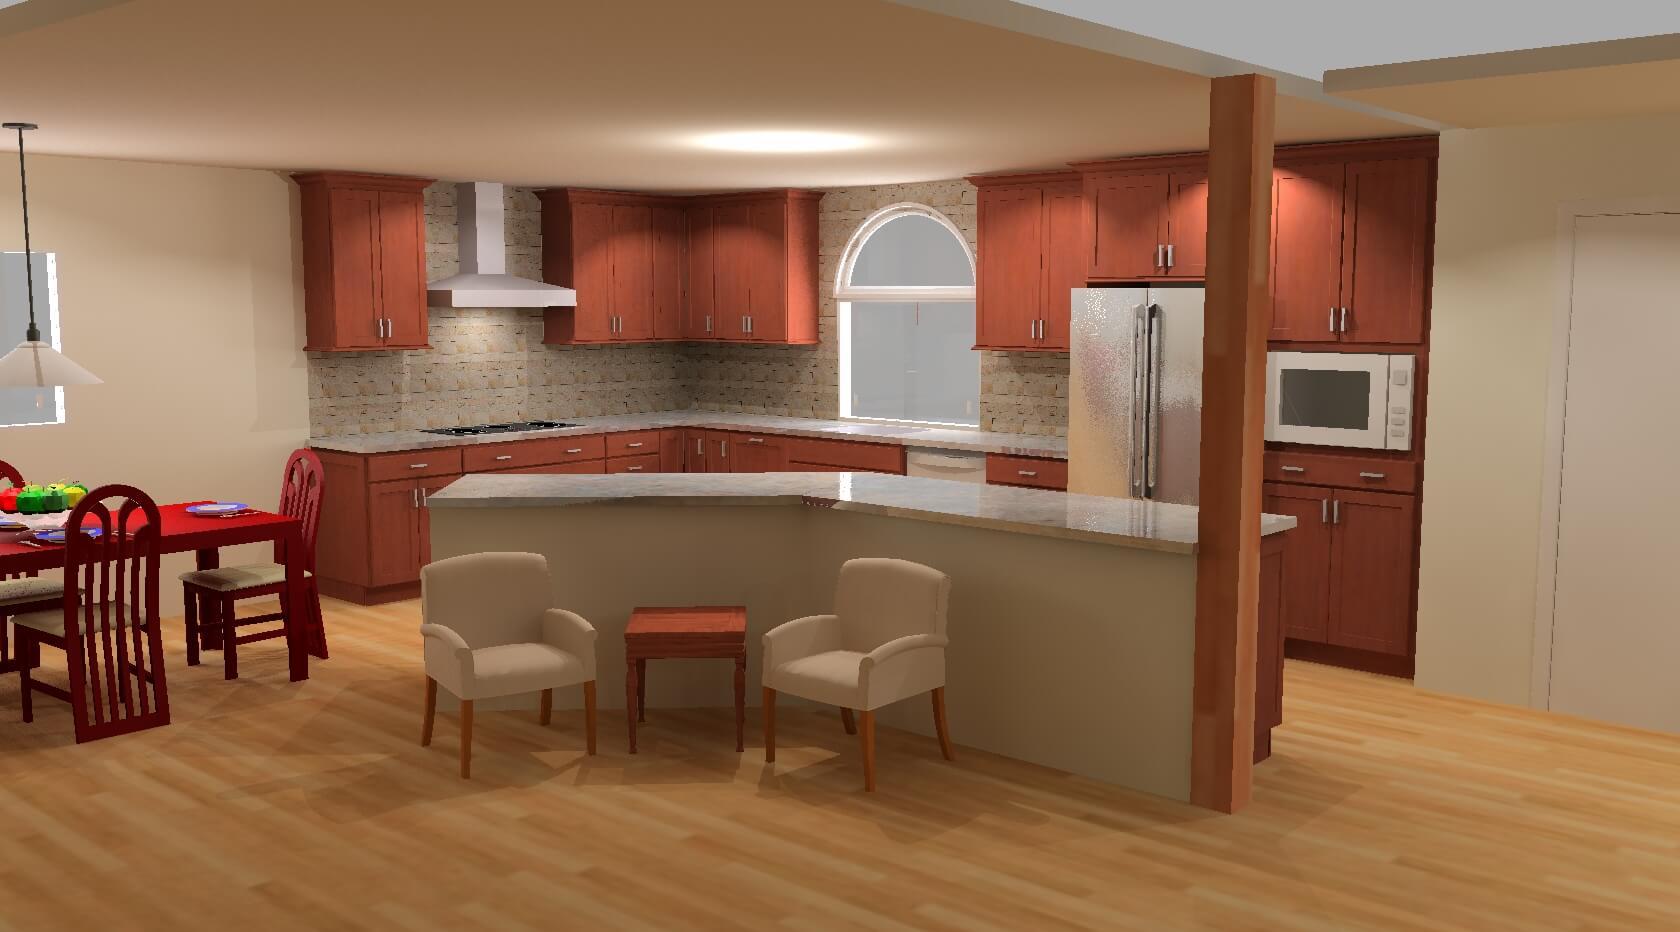 design build services classic home improvements